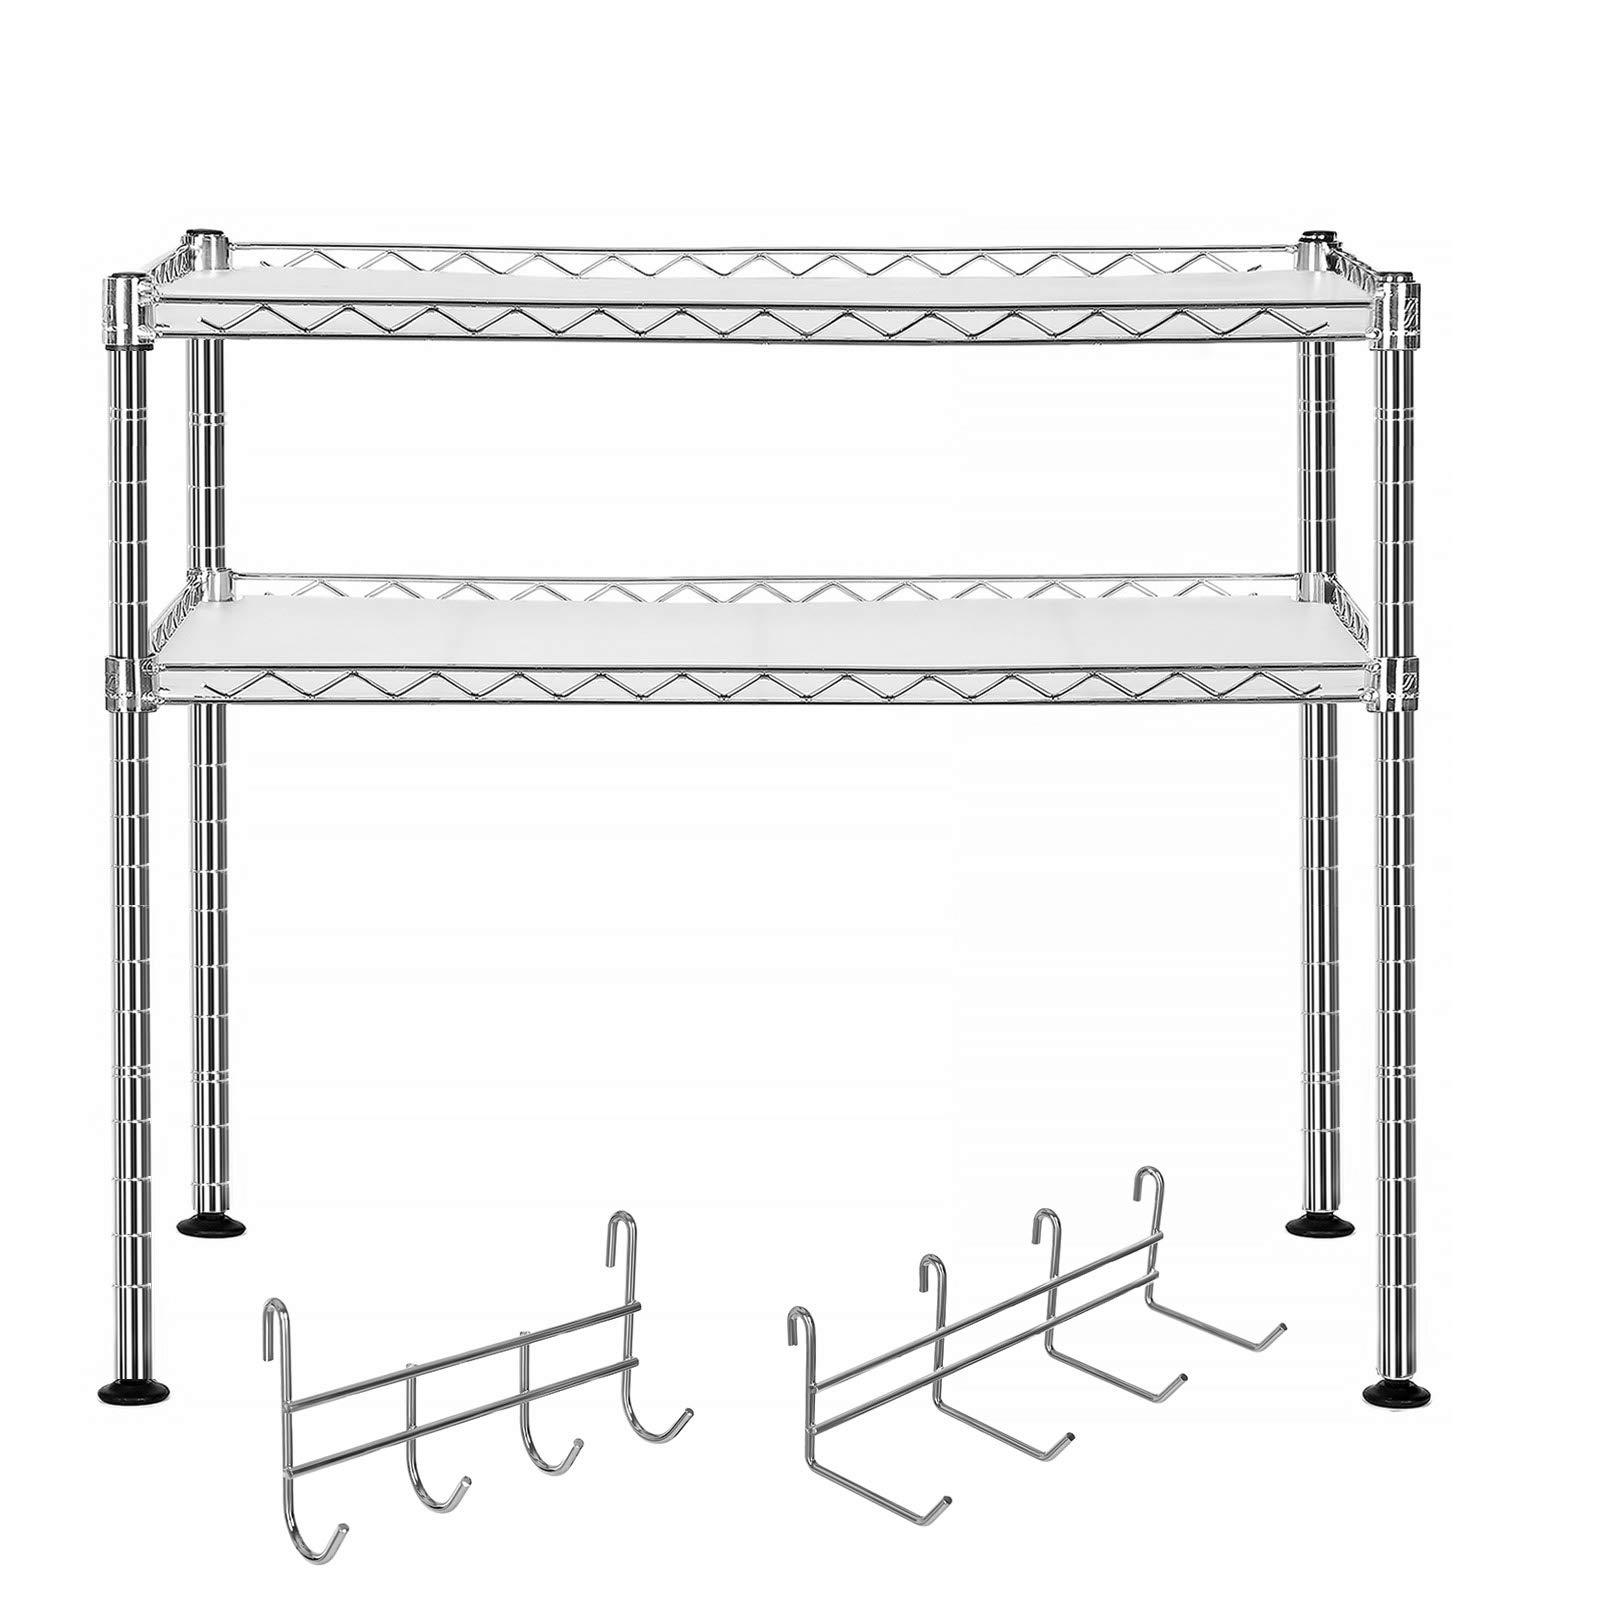 SONGMICS Microwave Oven Rack Organiser Chrome, Stand Shelf with 2 Adjustable Shelves 8 Hooks for Small Kitchen Storage LGR20C